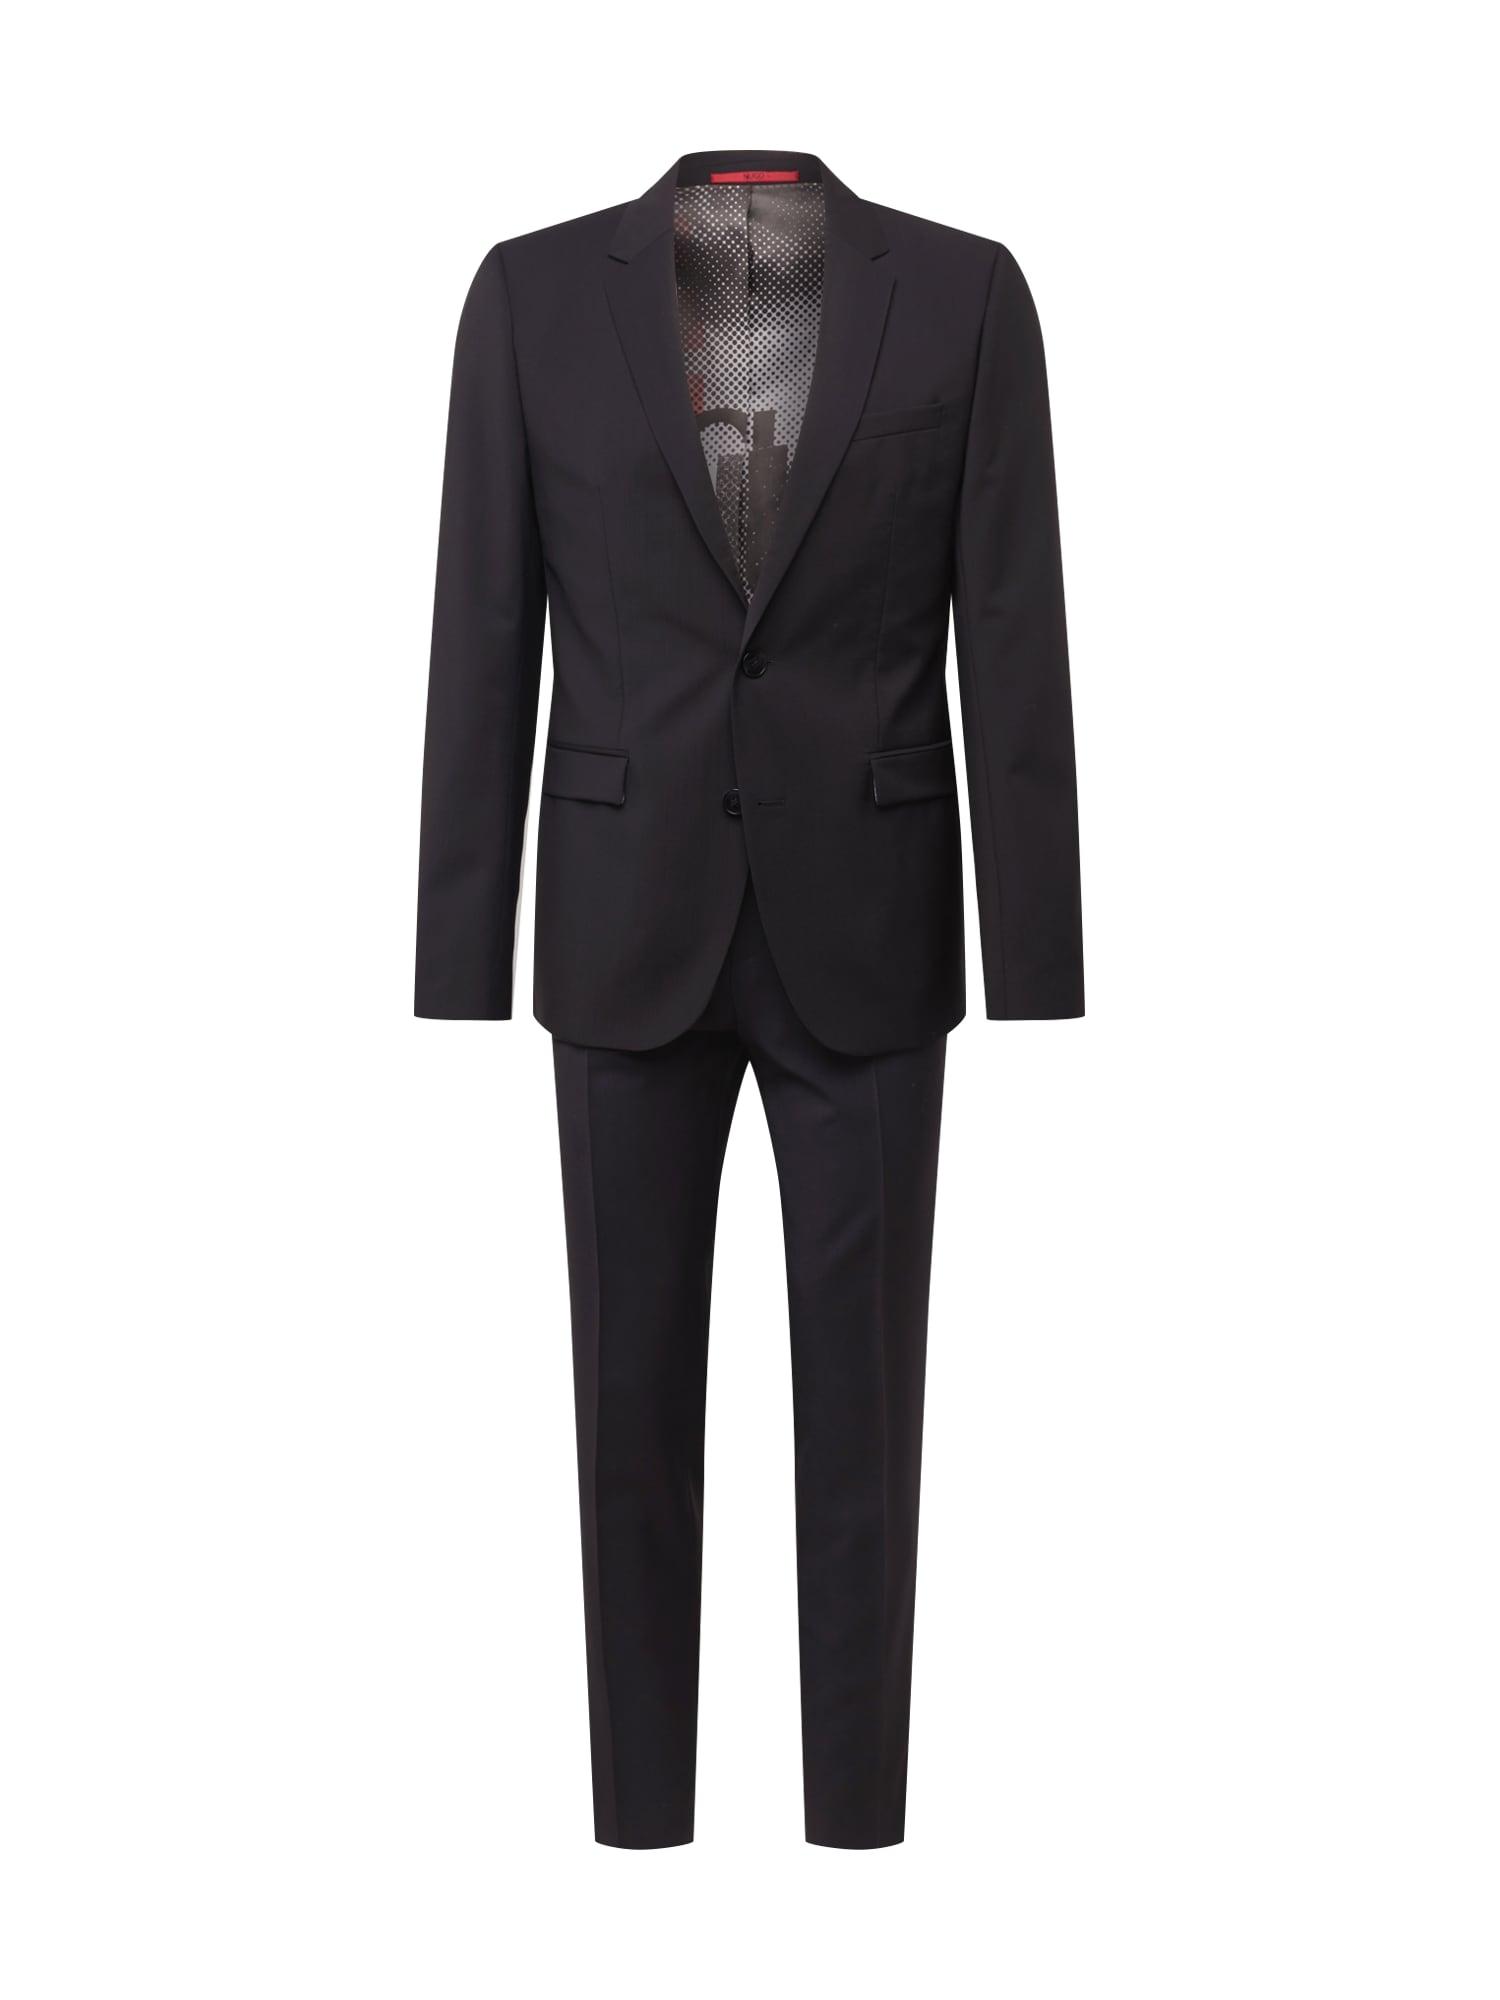 Oblek AstianHets černá HUGO